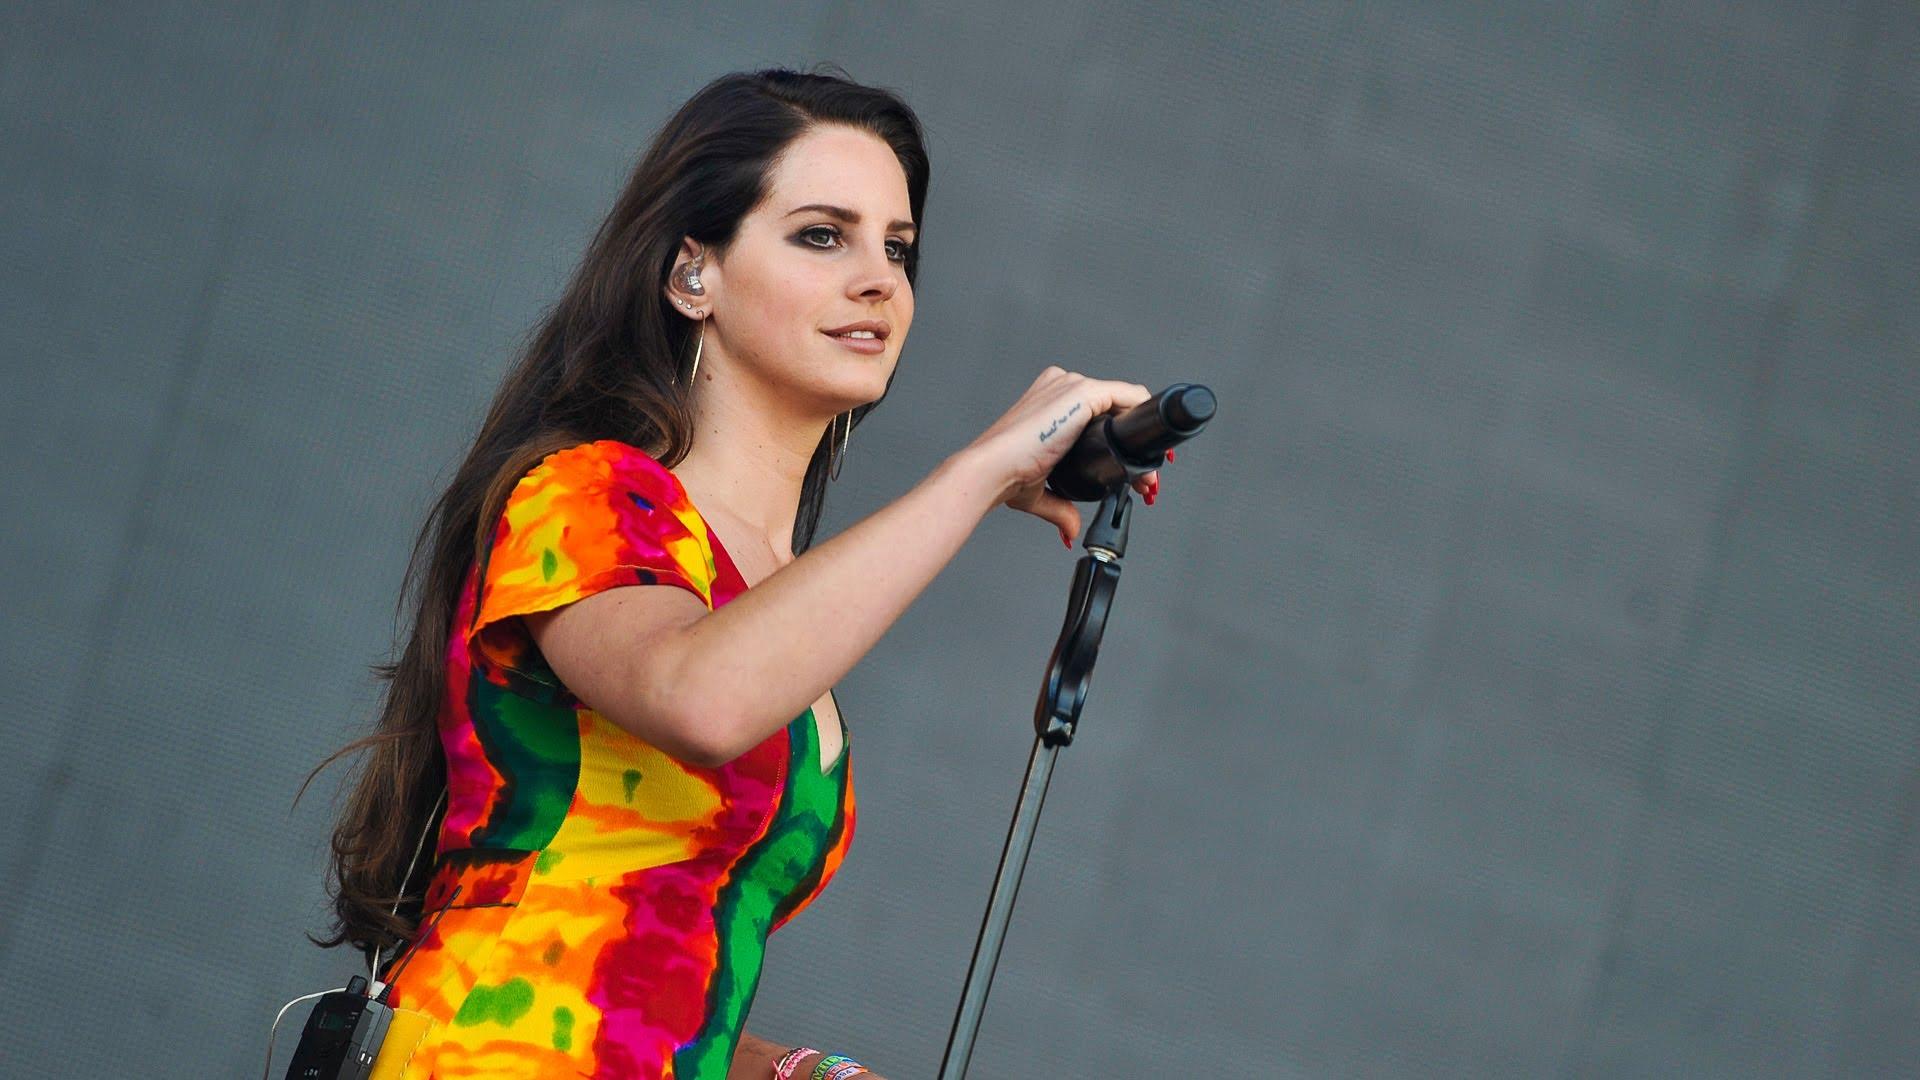 23 Hd Lana Del Rey Wallpapers